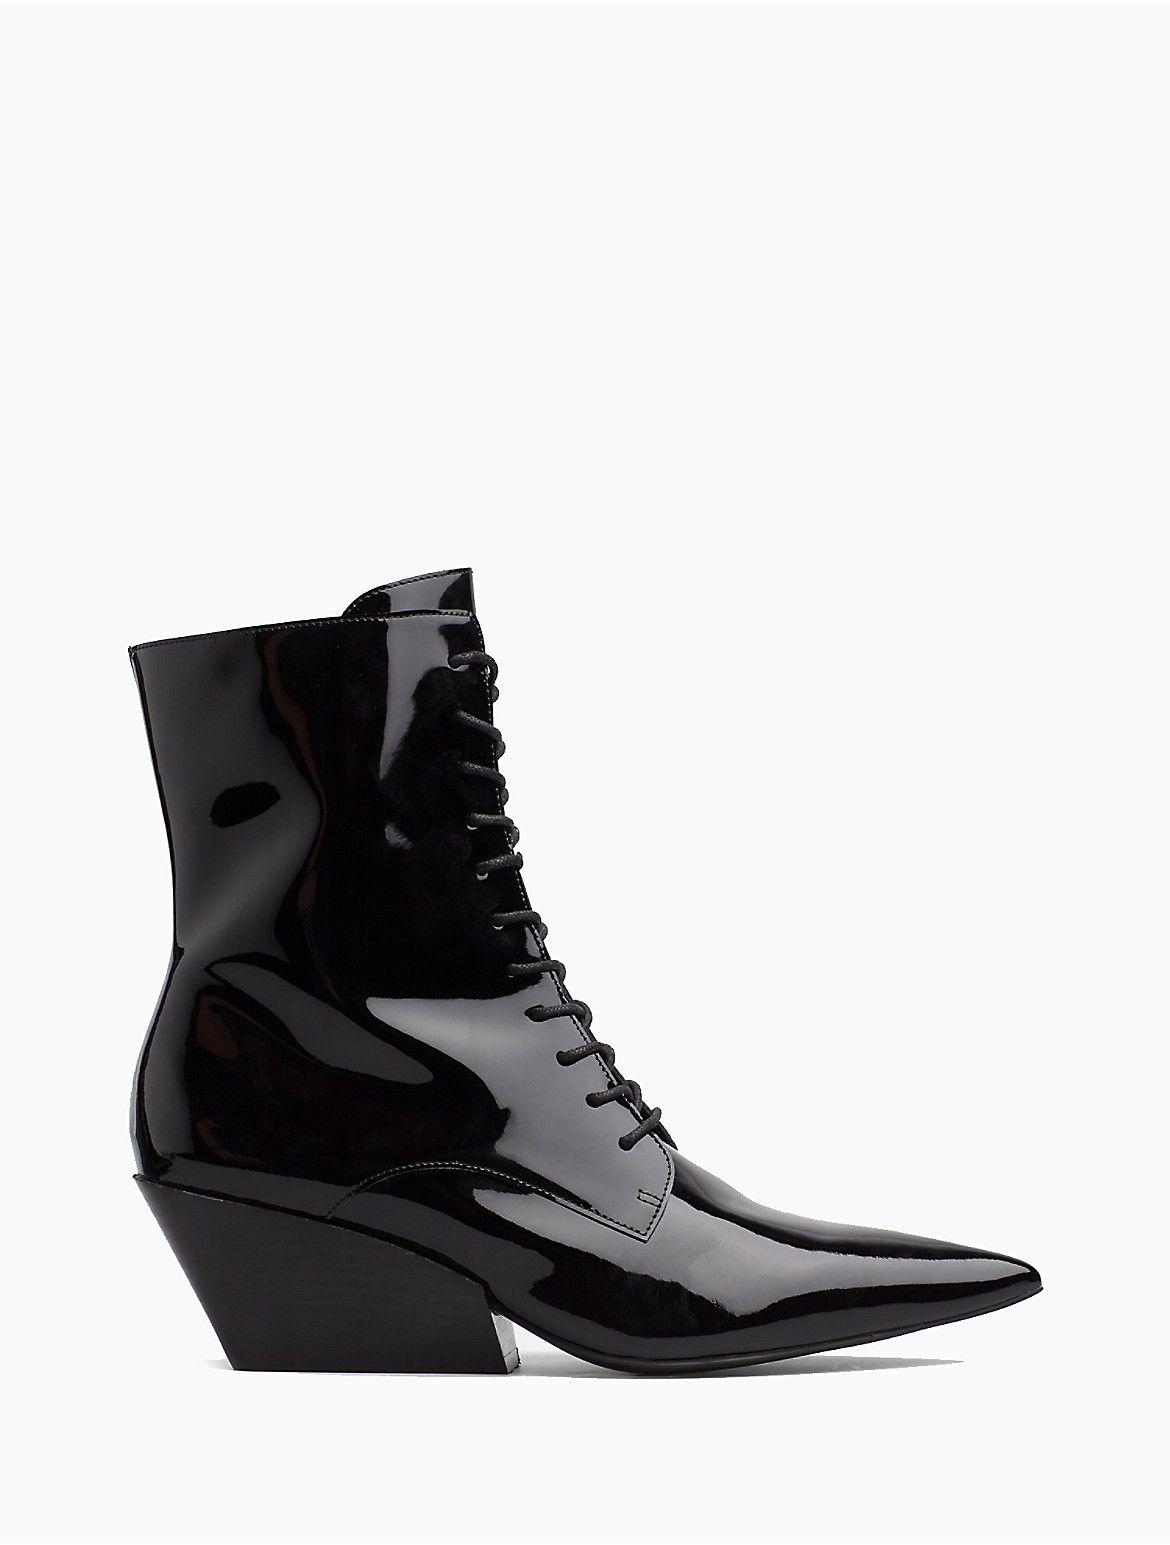 freda patent leather bootie   Calvin